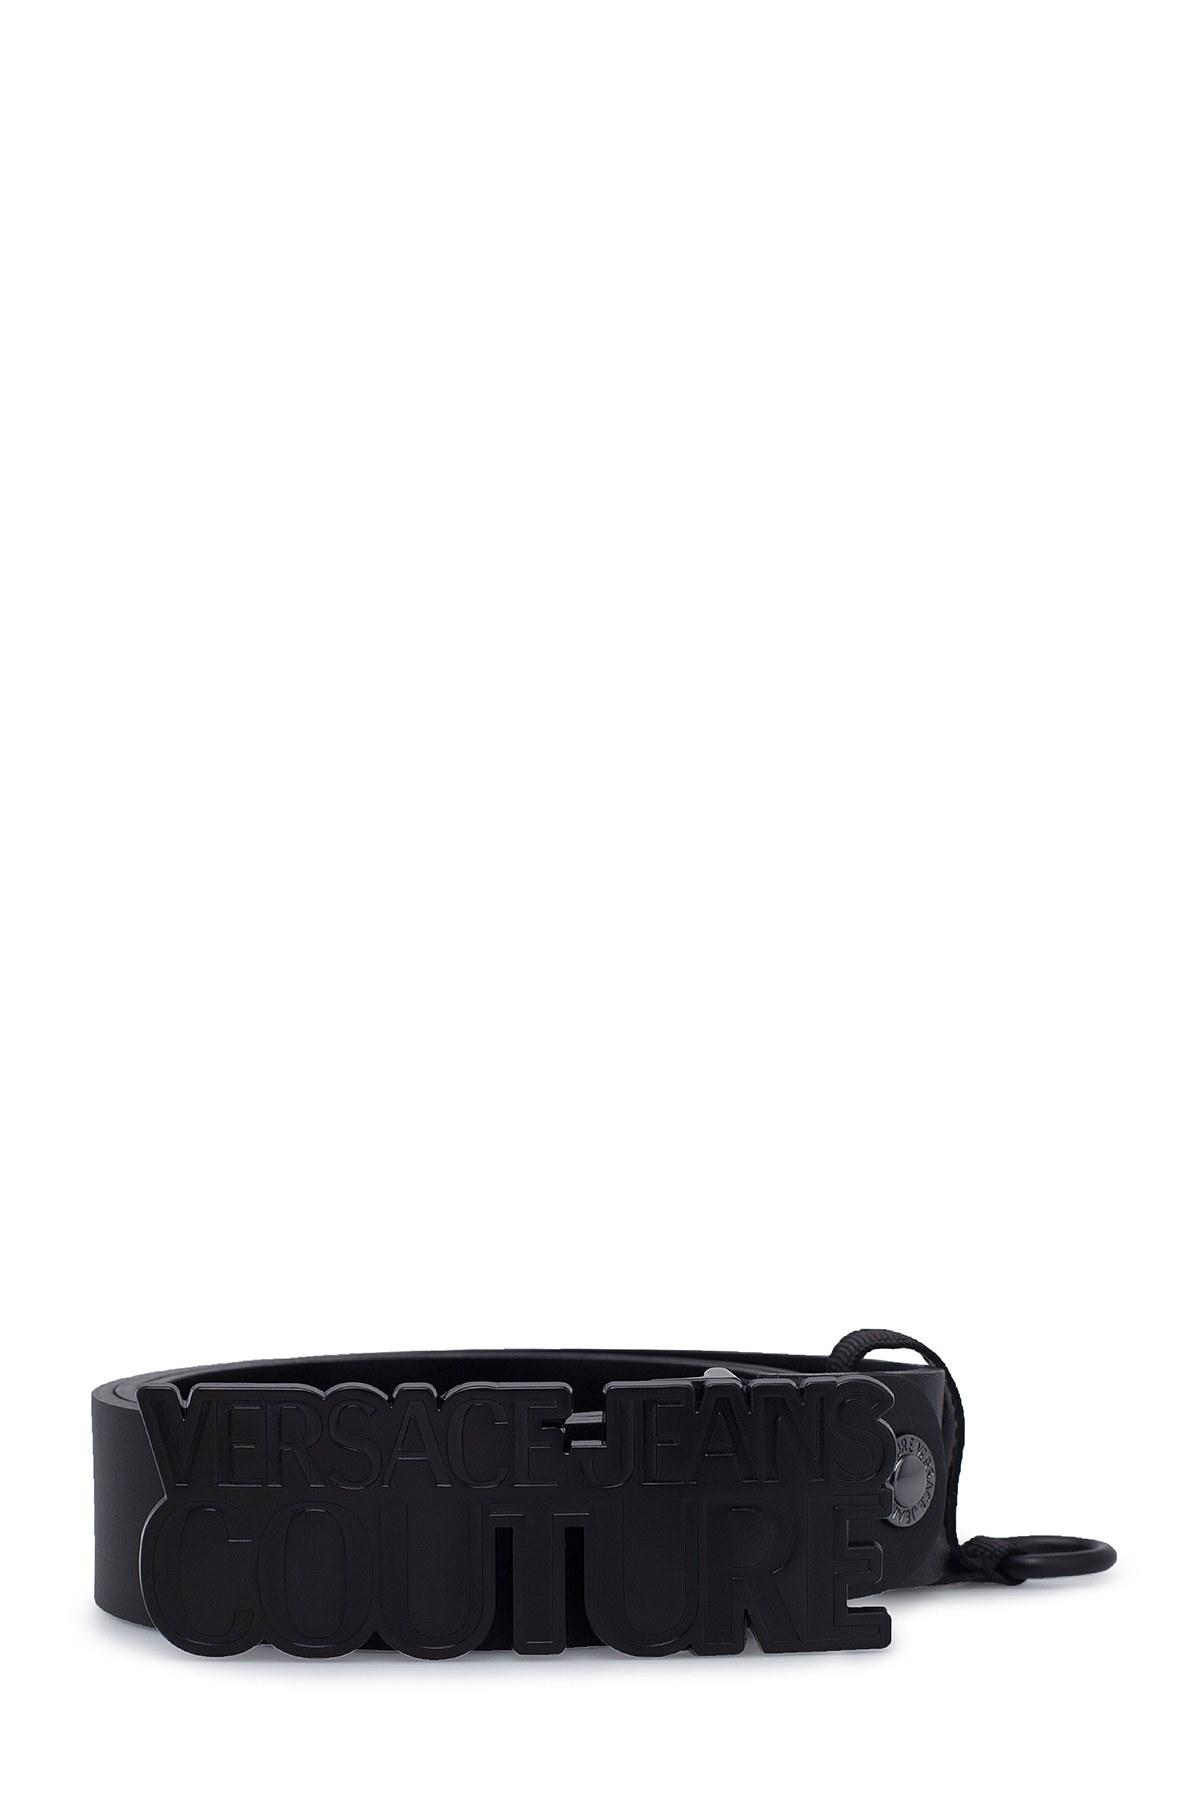 Versace Jeans Couture Erkek Kemer D8YVBF04 71549 899 SİYAH